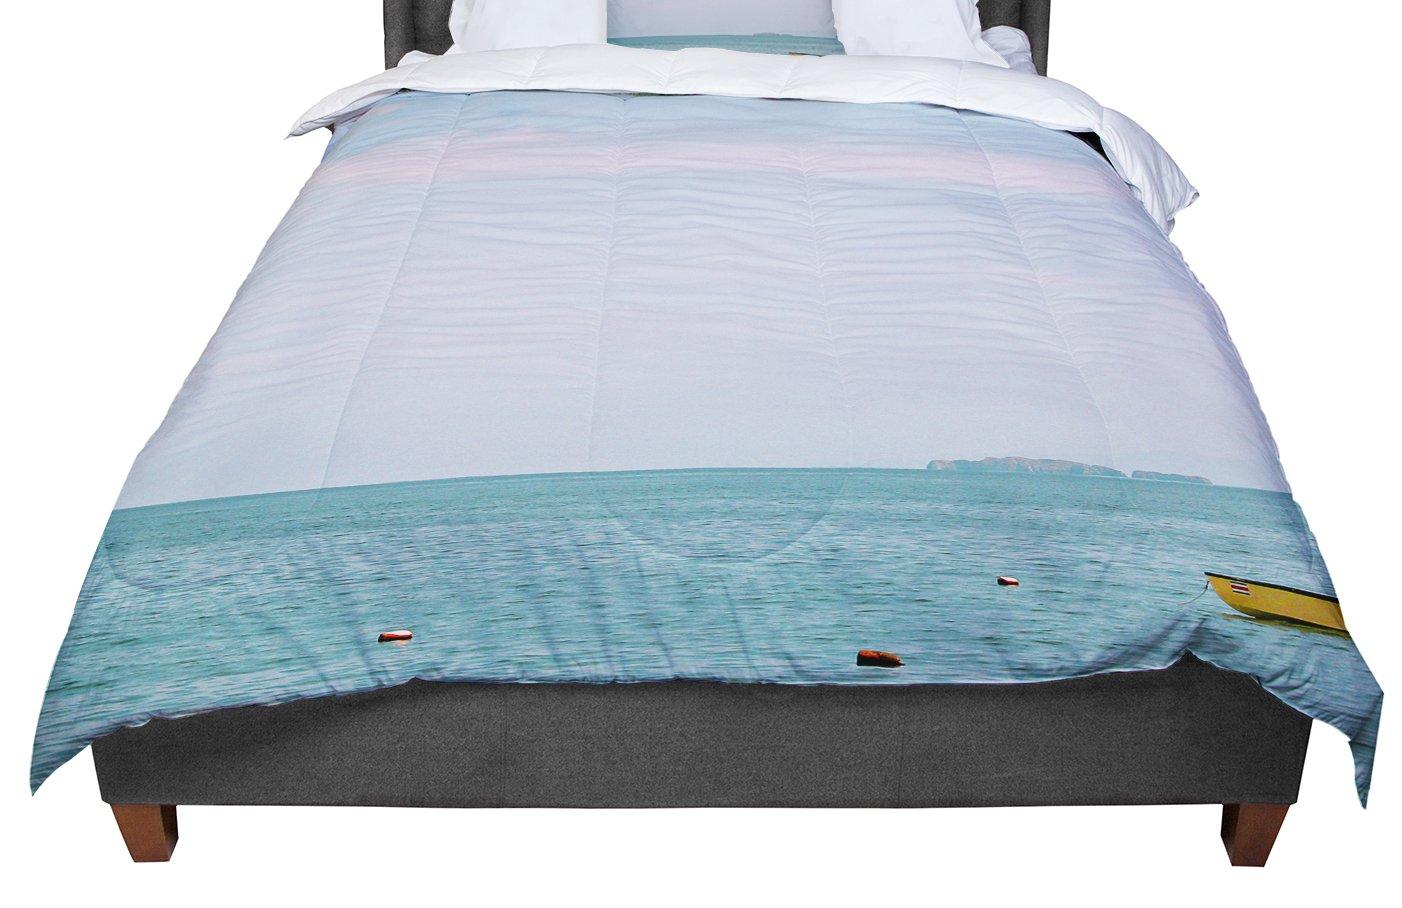 KESS InHouse Ann Barnes Castaway Teal Coastal Queen Comforter 88 X 88